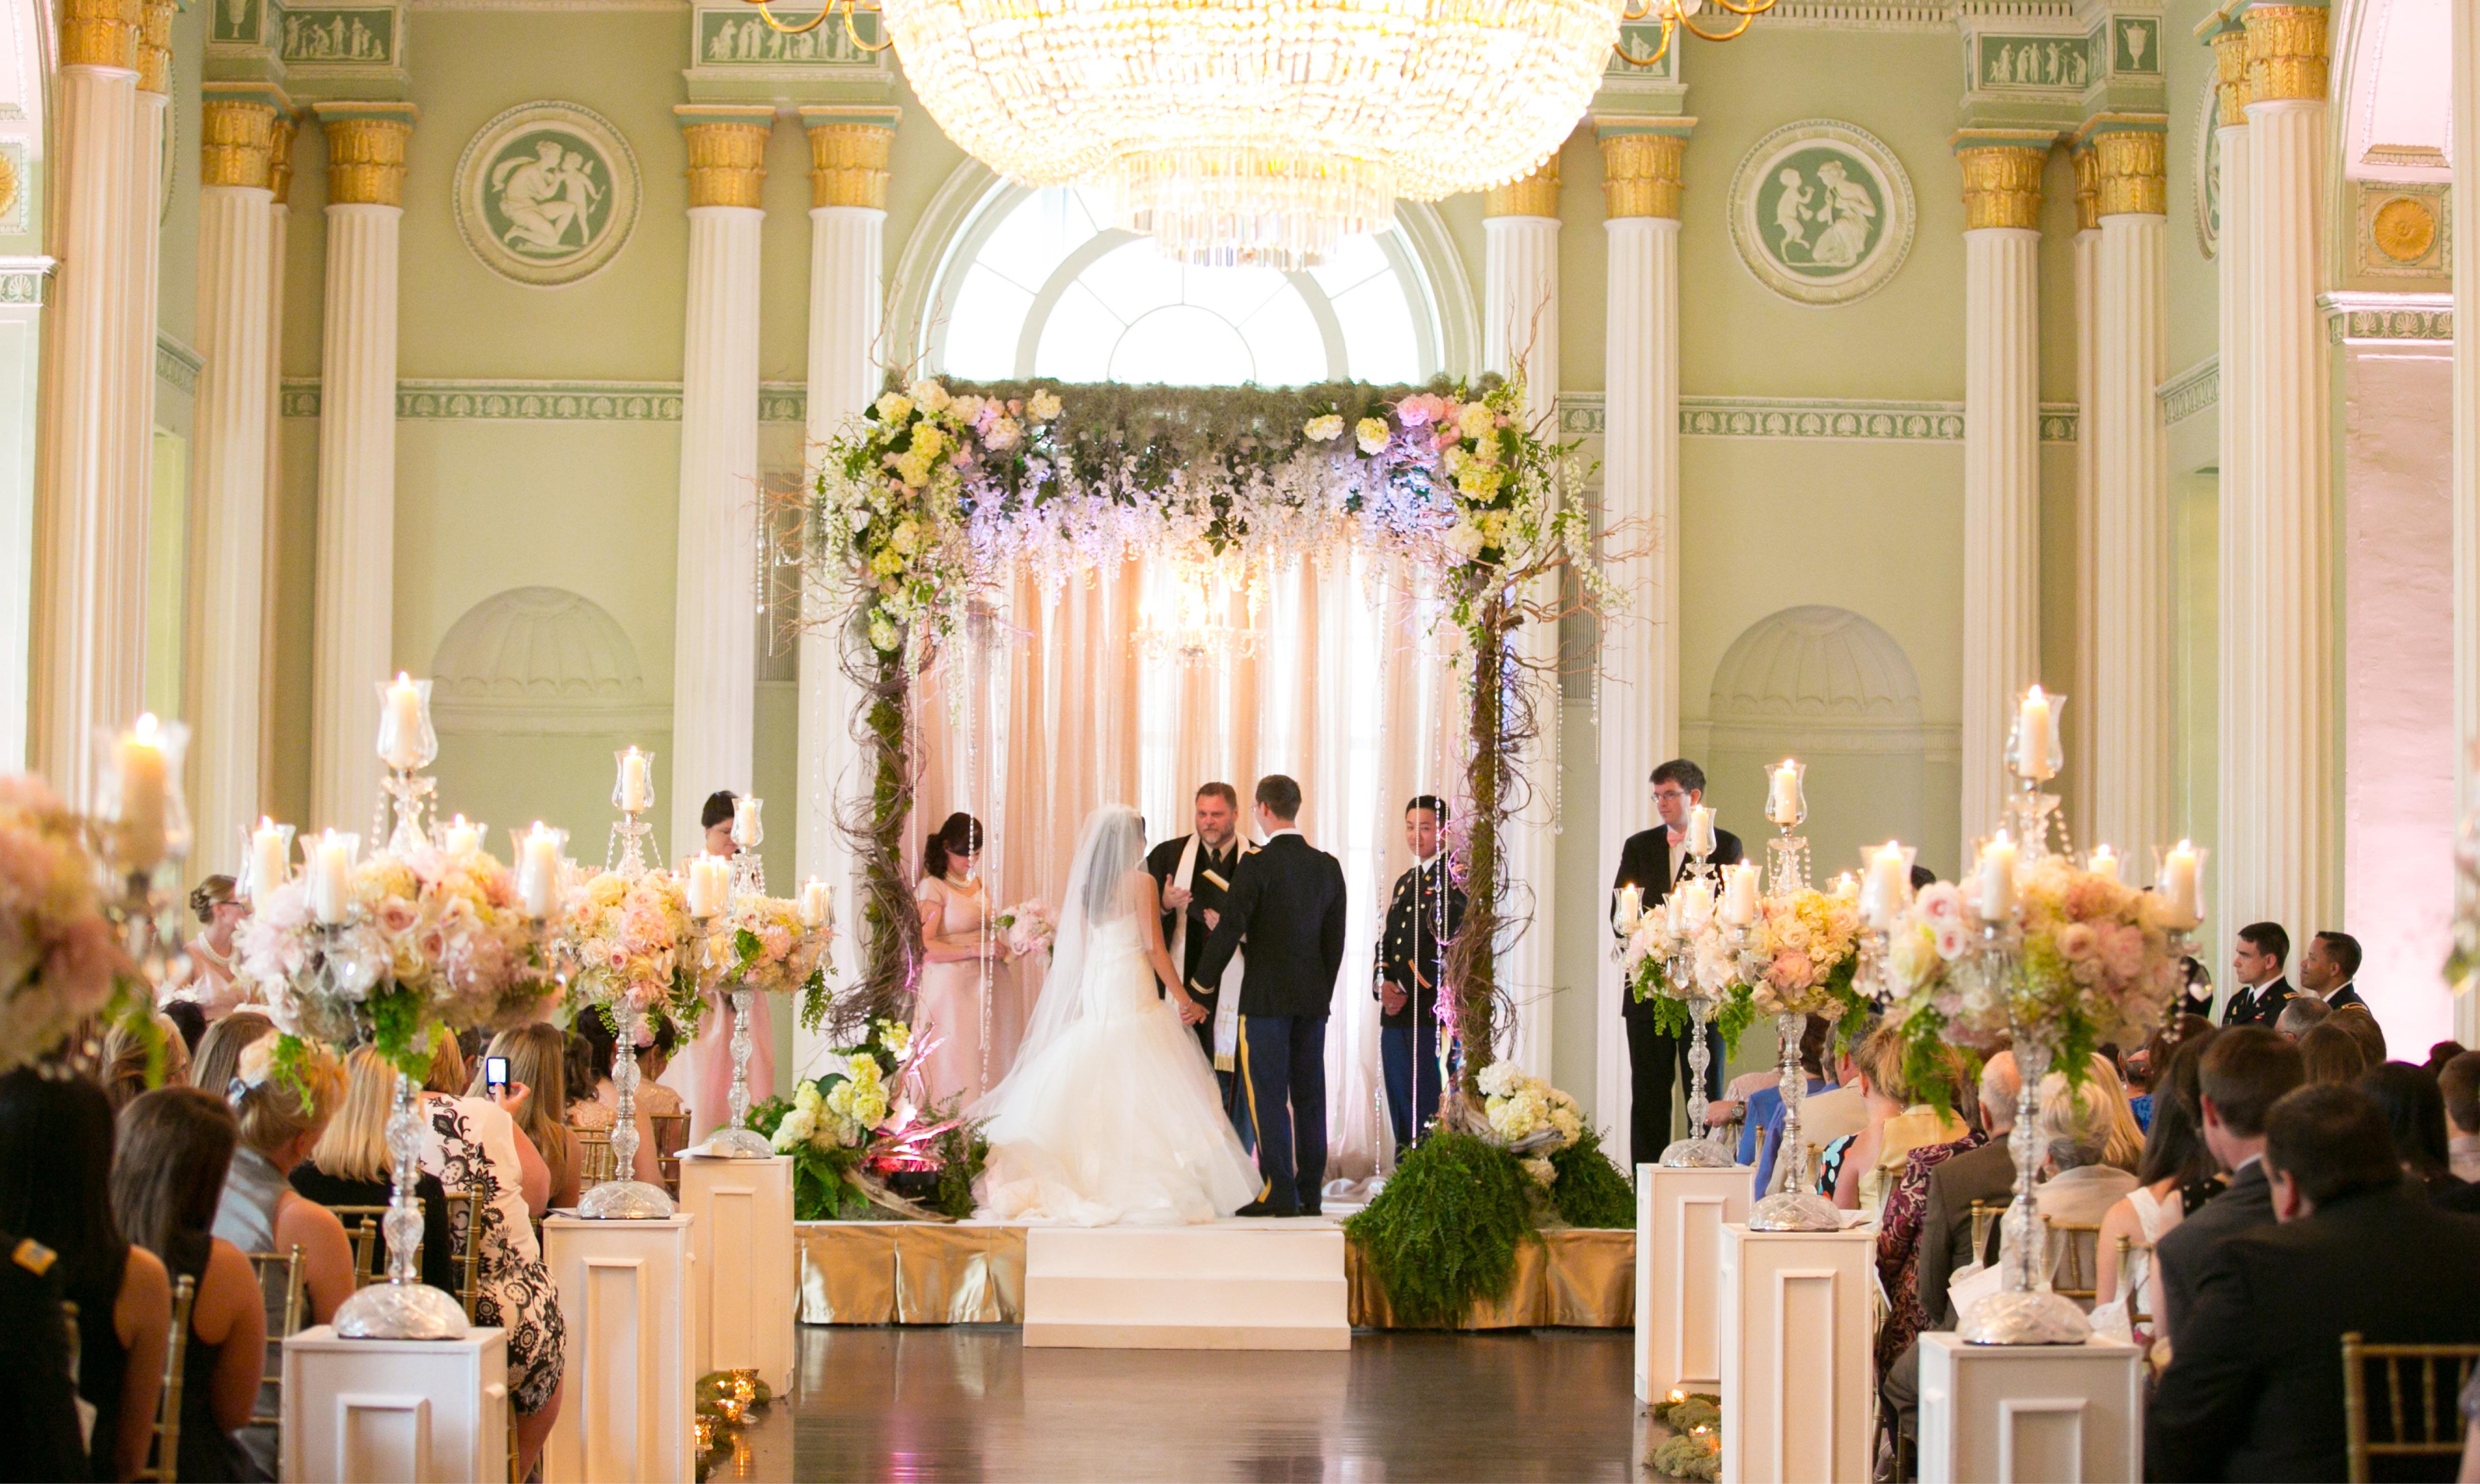 Fairytale Wedding at The Biltmore Ballrooms